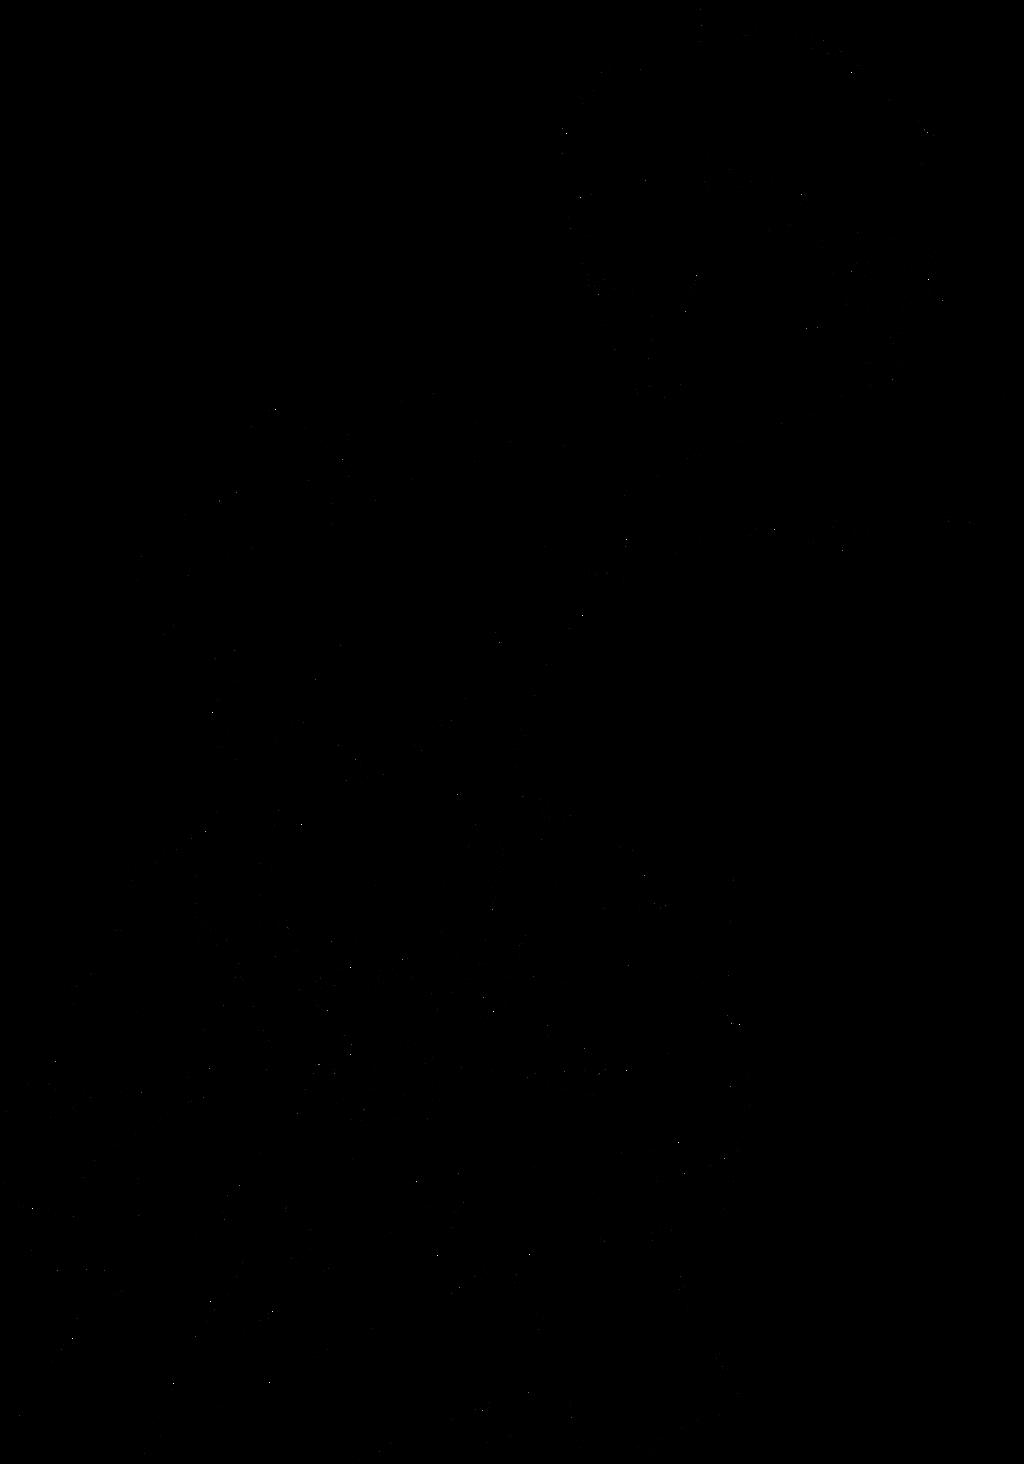 Dibujos Naruto Shippuden Dibujar Faciles Bonitos likewise Menma Uzumaki Lineart 319387037 moreover Naruto Nine Tails Chakra Mode 291423594 furthermore Boruto And Naruto Uzumaki Line 542435801 additionally Naruto Org. on minato coloring pages